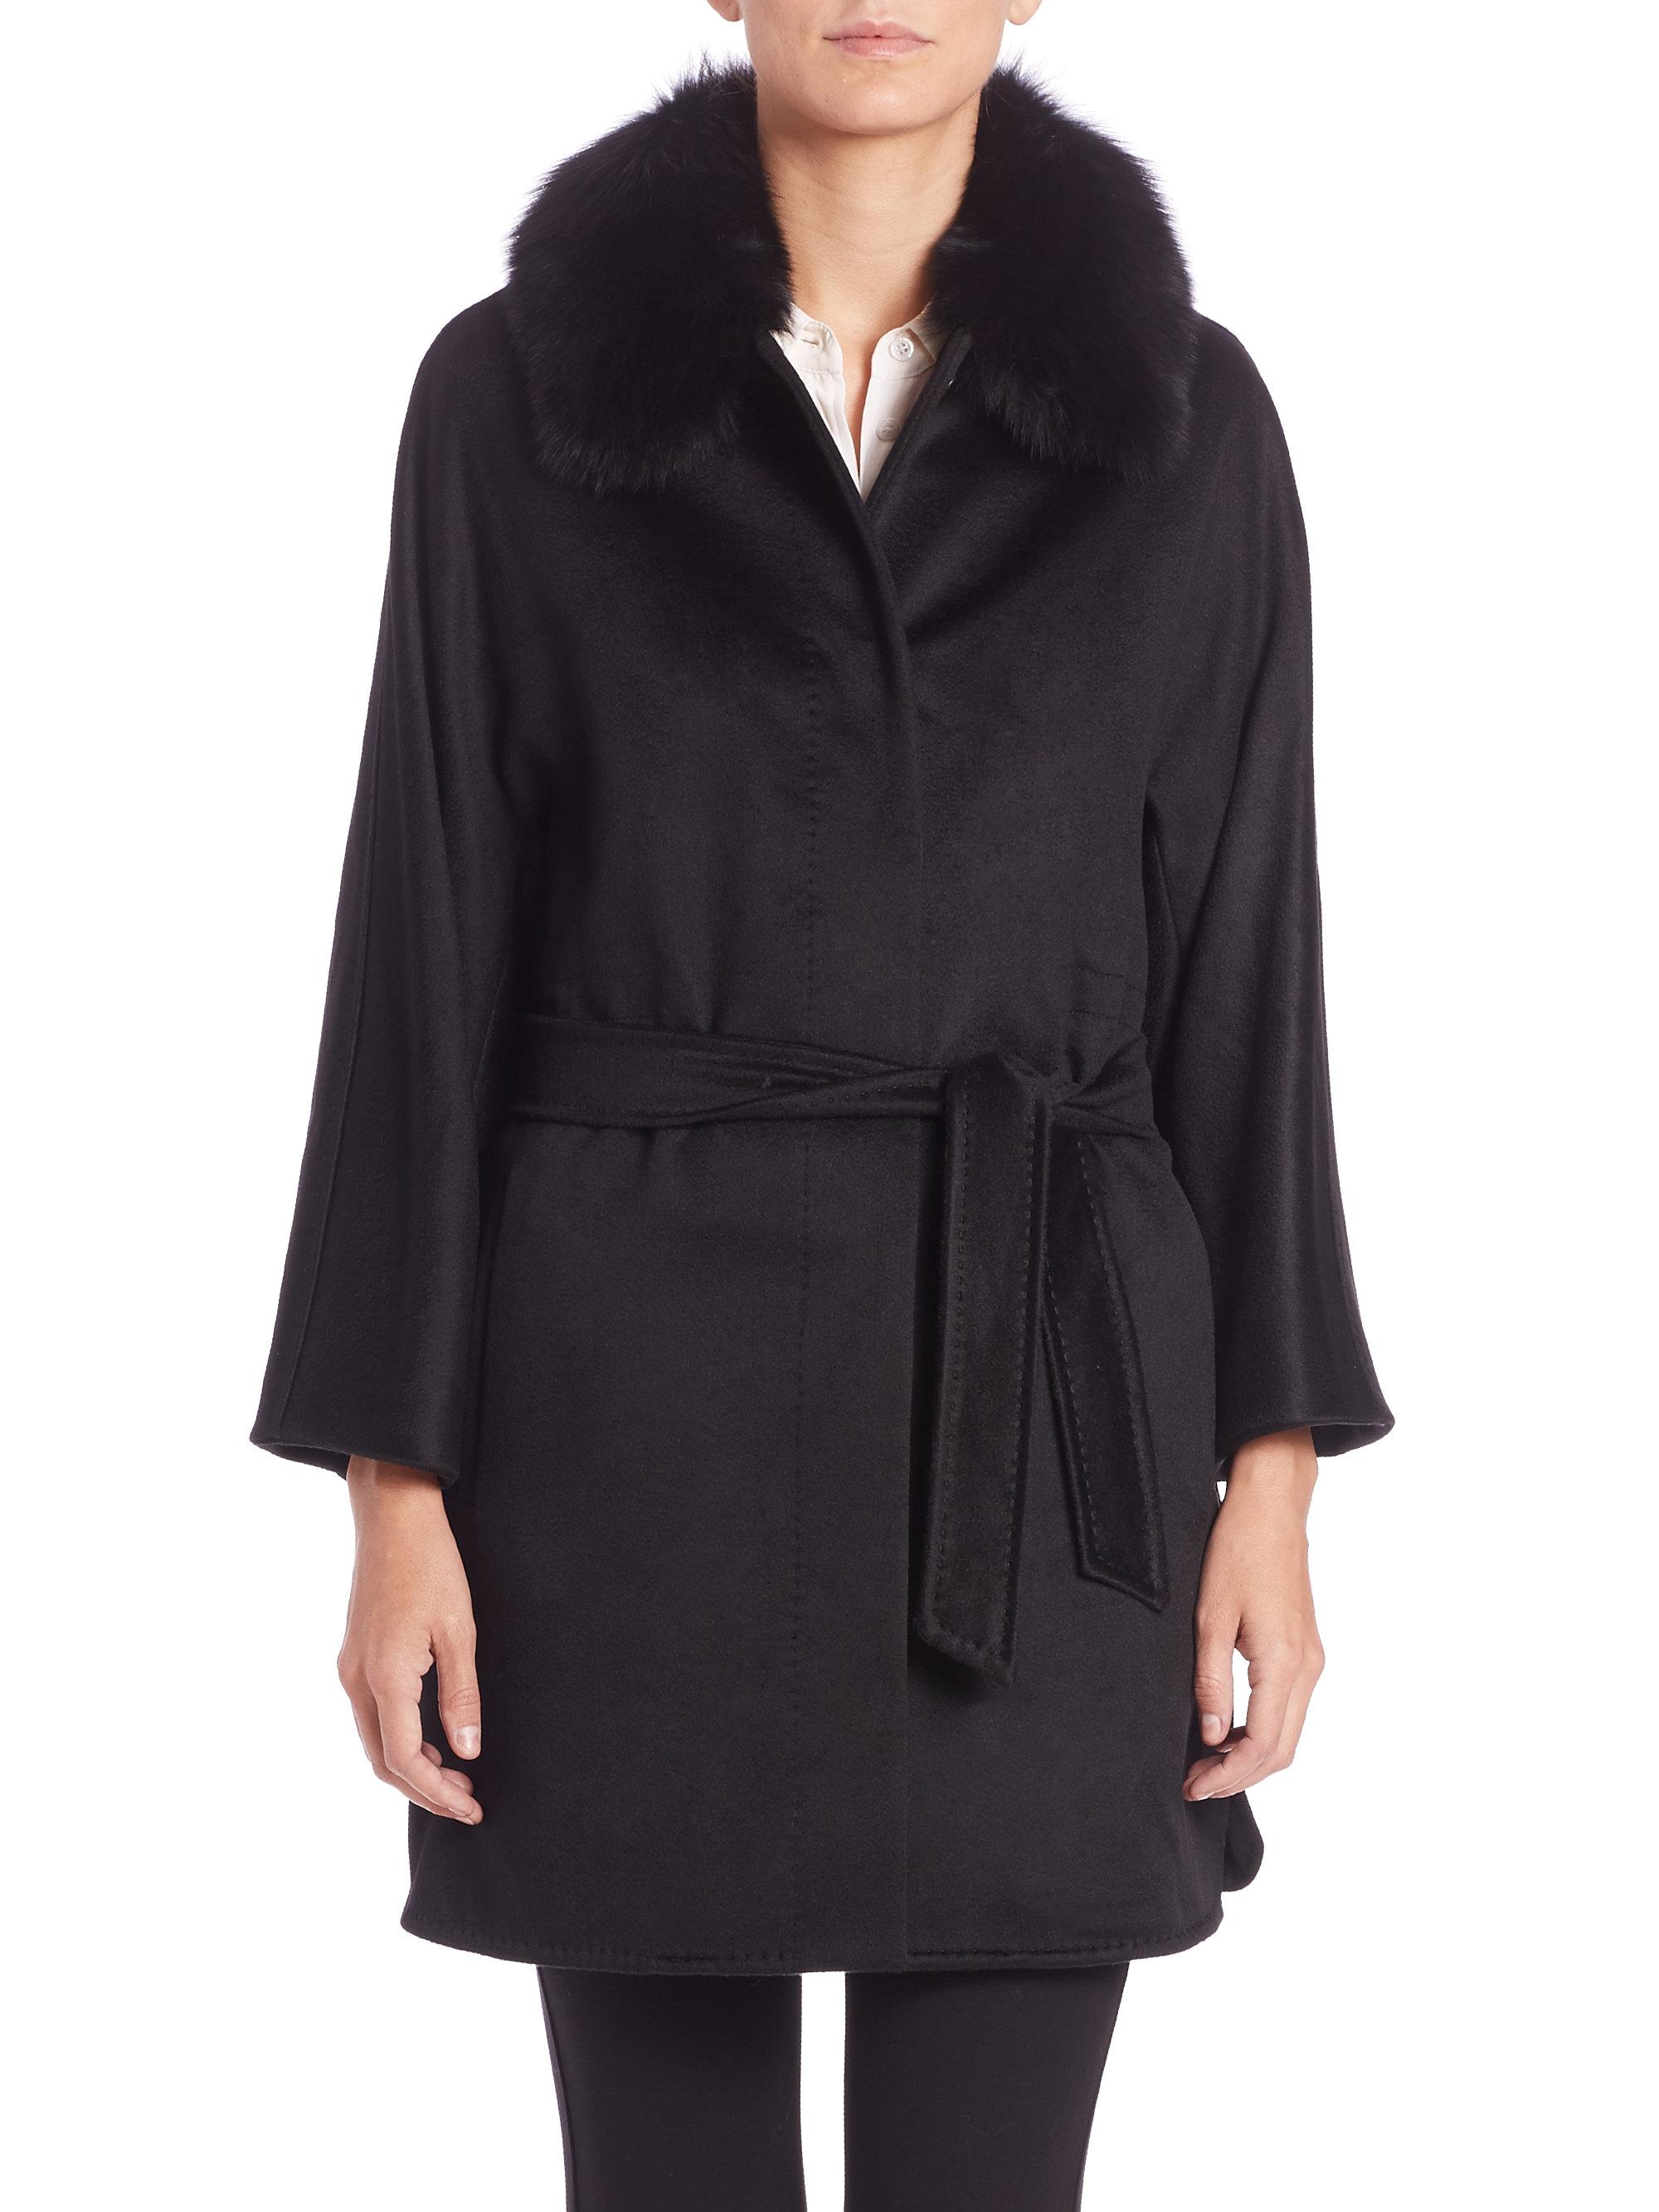 Max mara studio Donata Fur-collar Cashmere Belted Coat in Black | Lyst